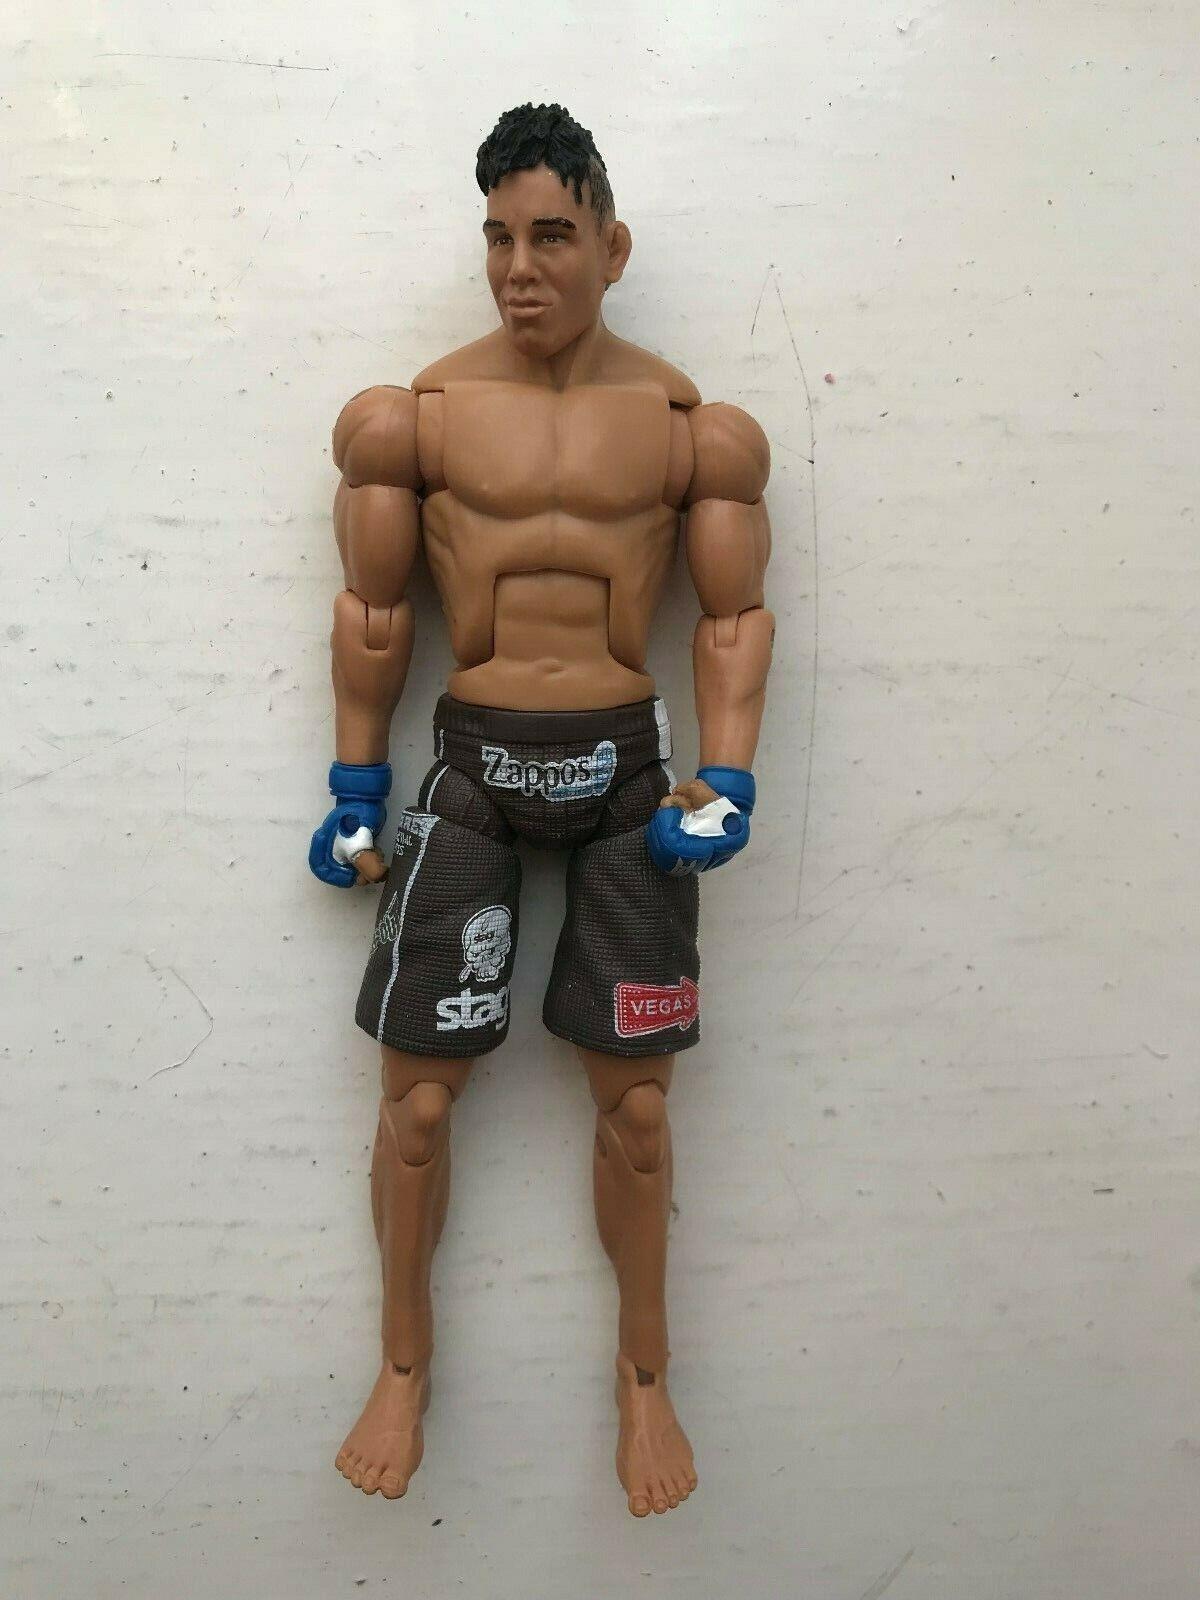 RARE RARE RARE UFC MIGUEL ANGEL TORRES DELUXE COLLECTION SERIES 0 JAKKS ACTION FIGURE WEC 7d2364